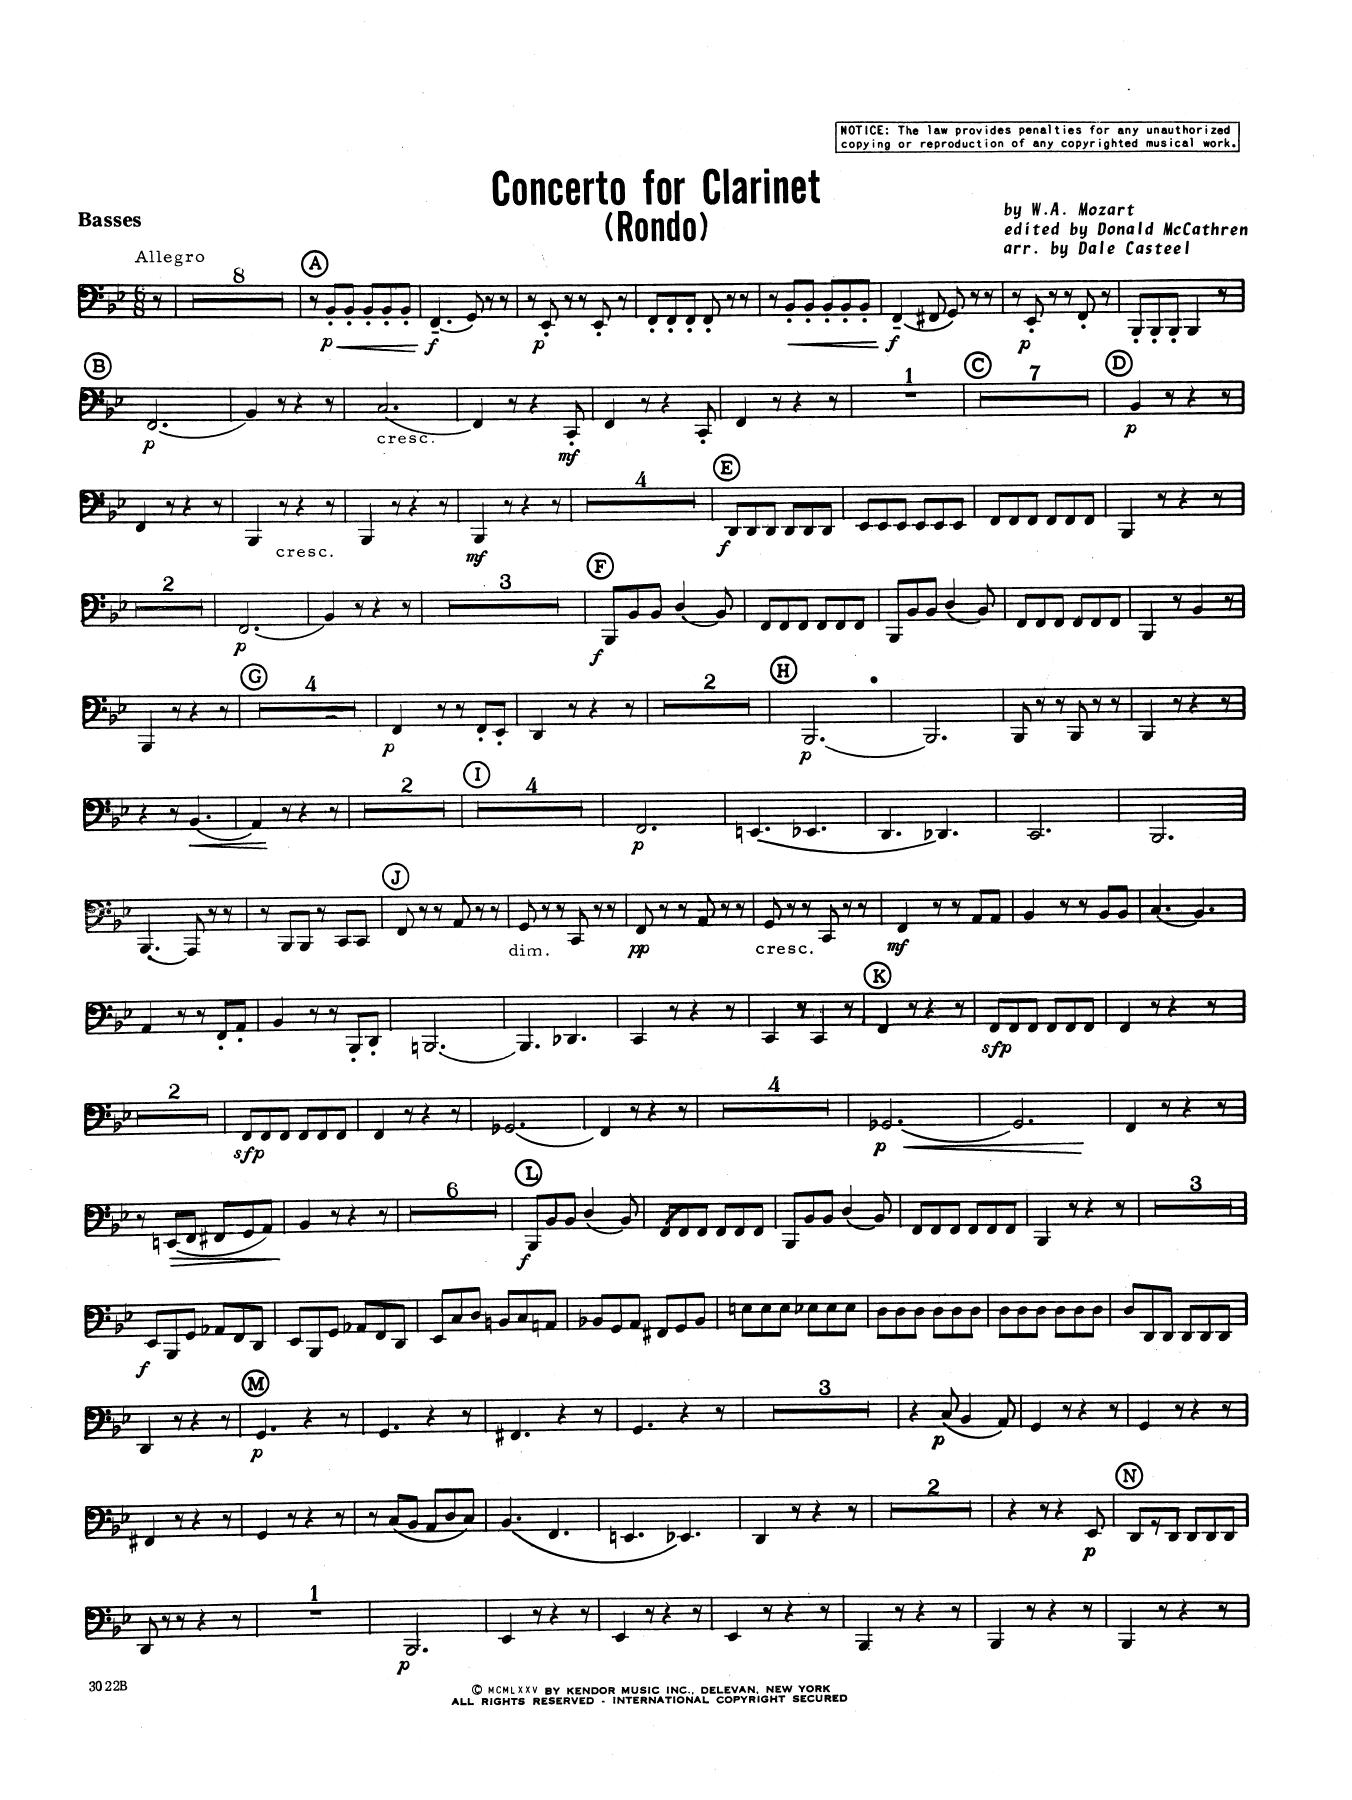 Donald McCathren and Dale Casteel Concerto For Clarinet - Rondo (3rd Movement) - K.622 - Tuba sheet music notes printable PDF score